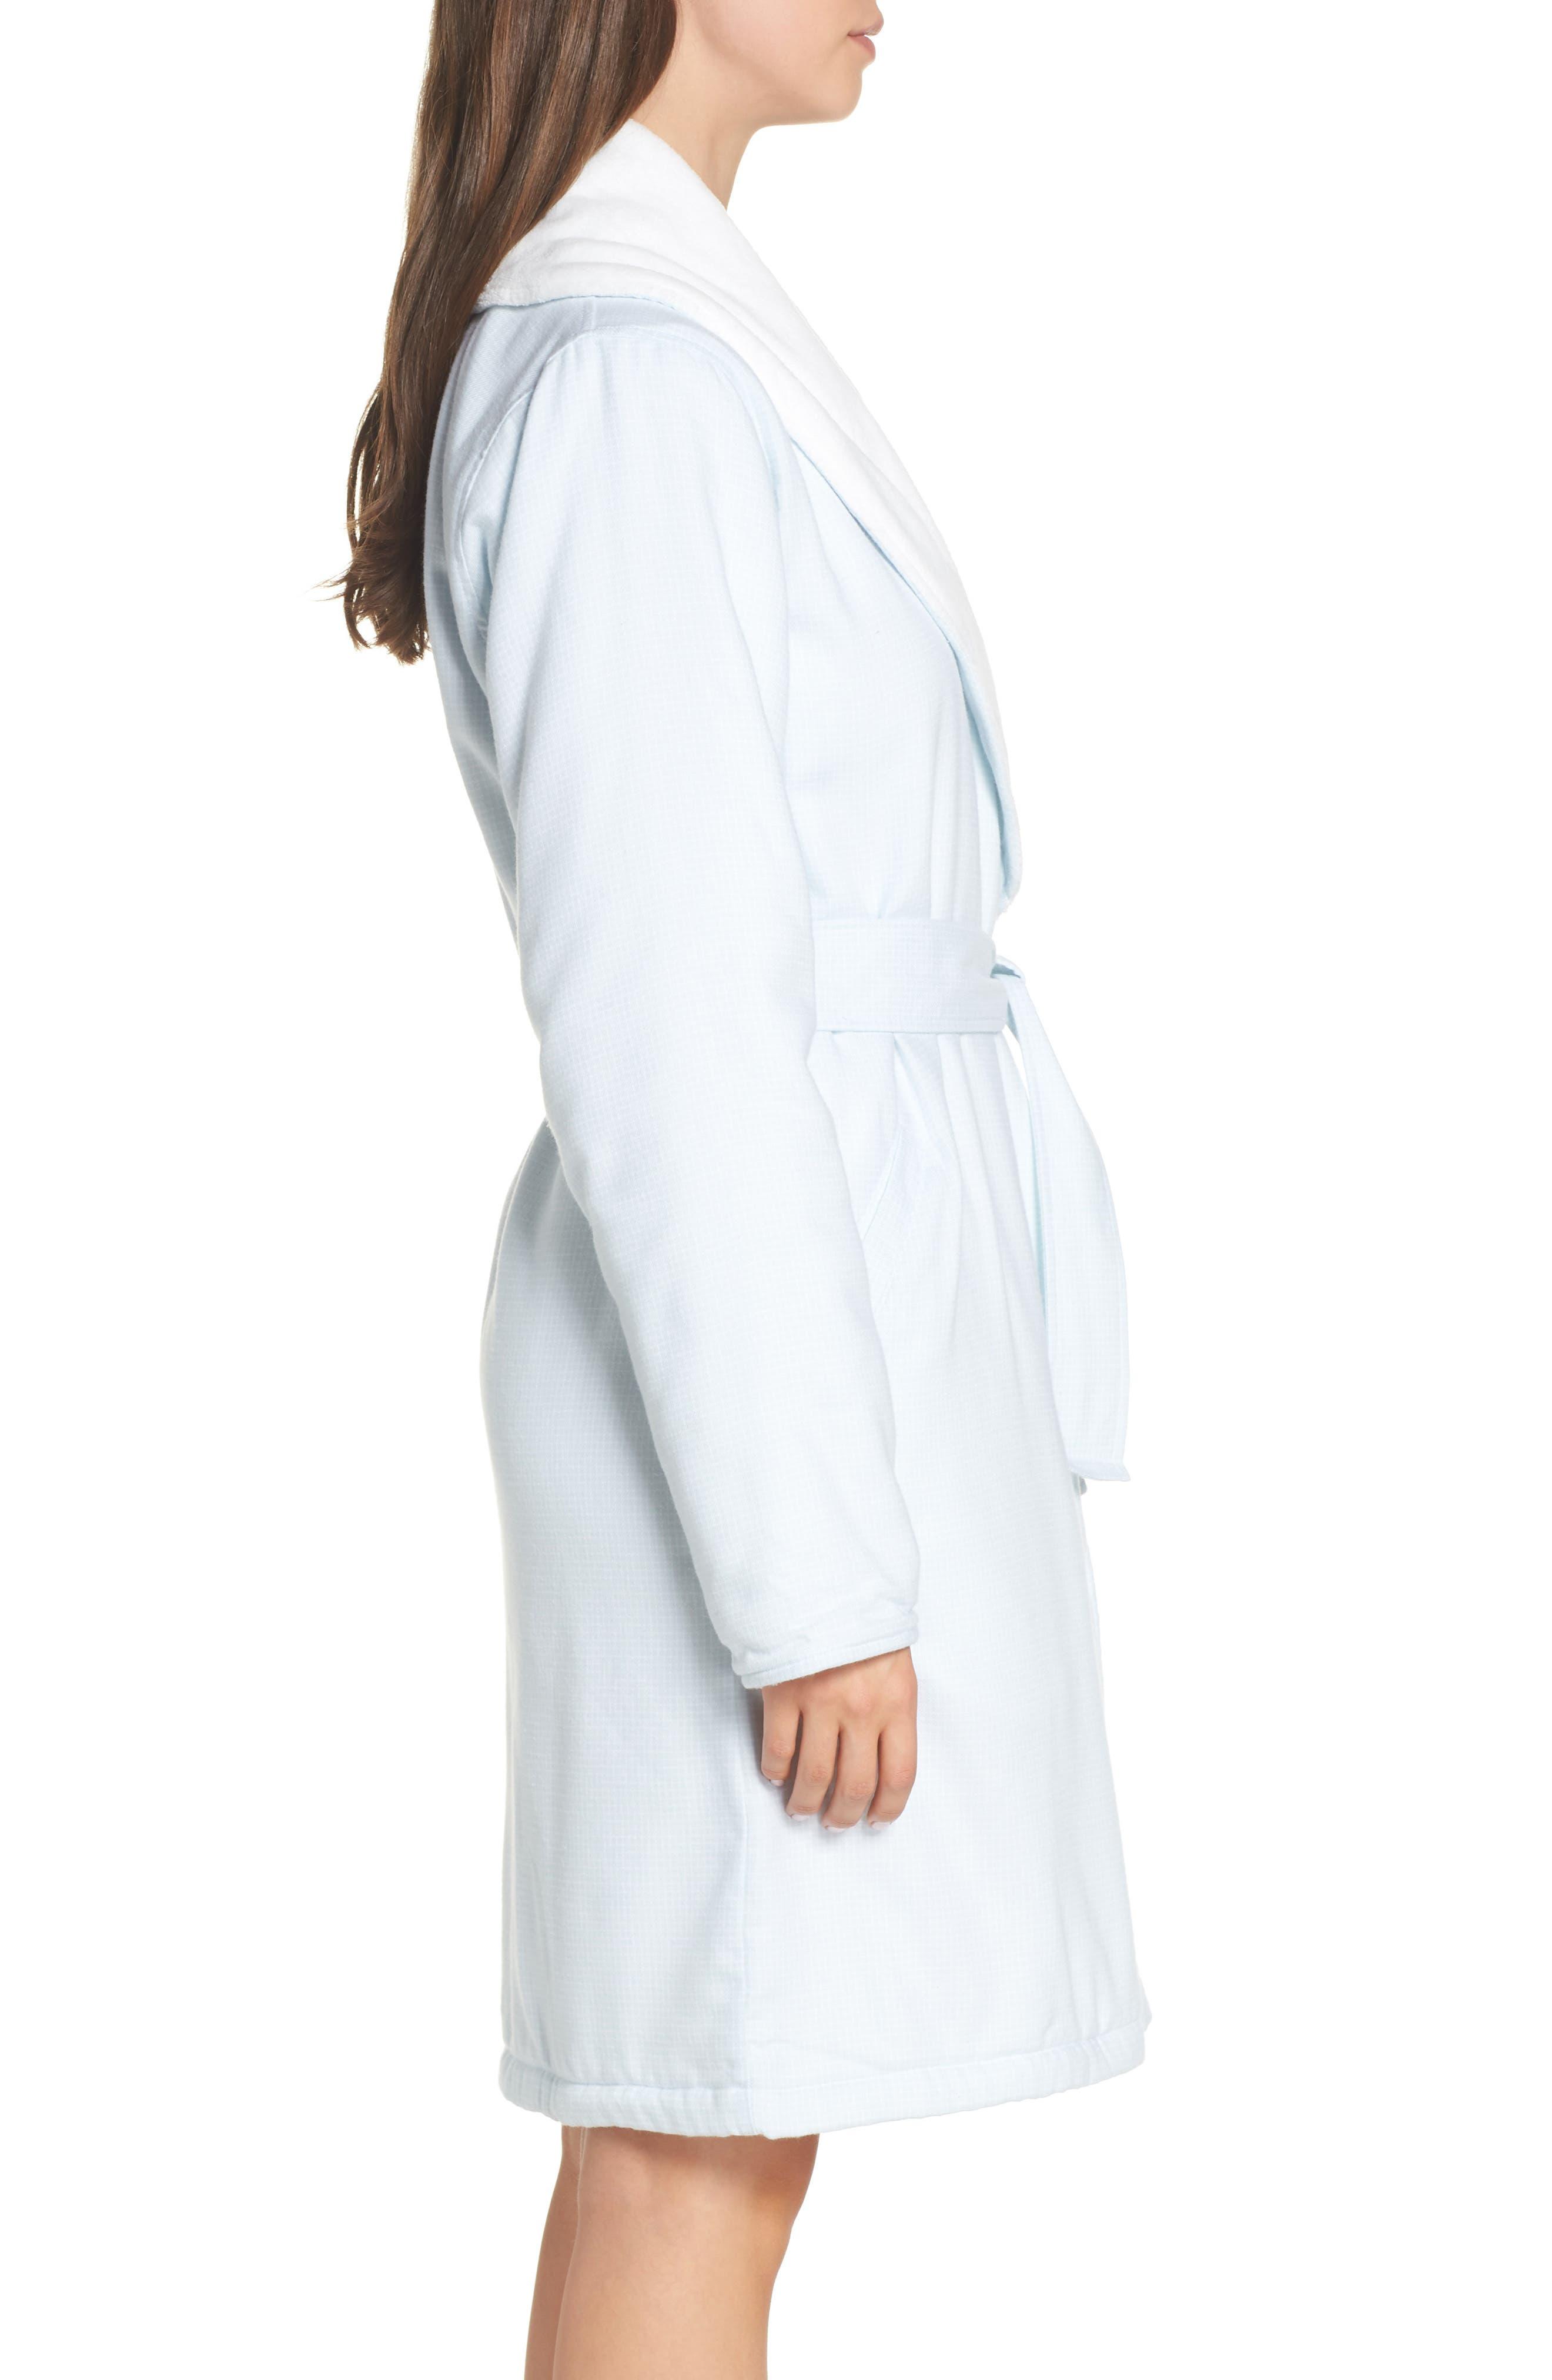 Anika Fleece Lined Flannel Robe,                             Alternate thumbnail 3, color,                             SKY BLUE / WHITE CHECK